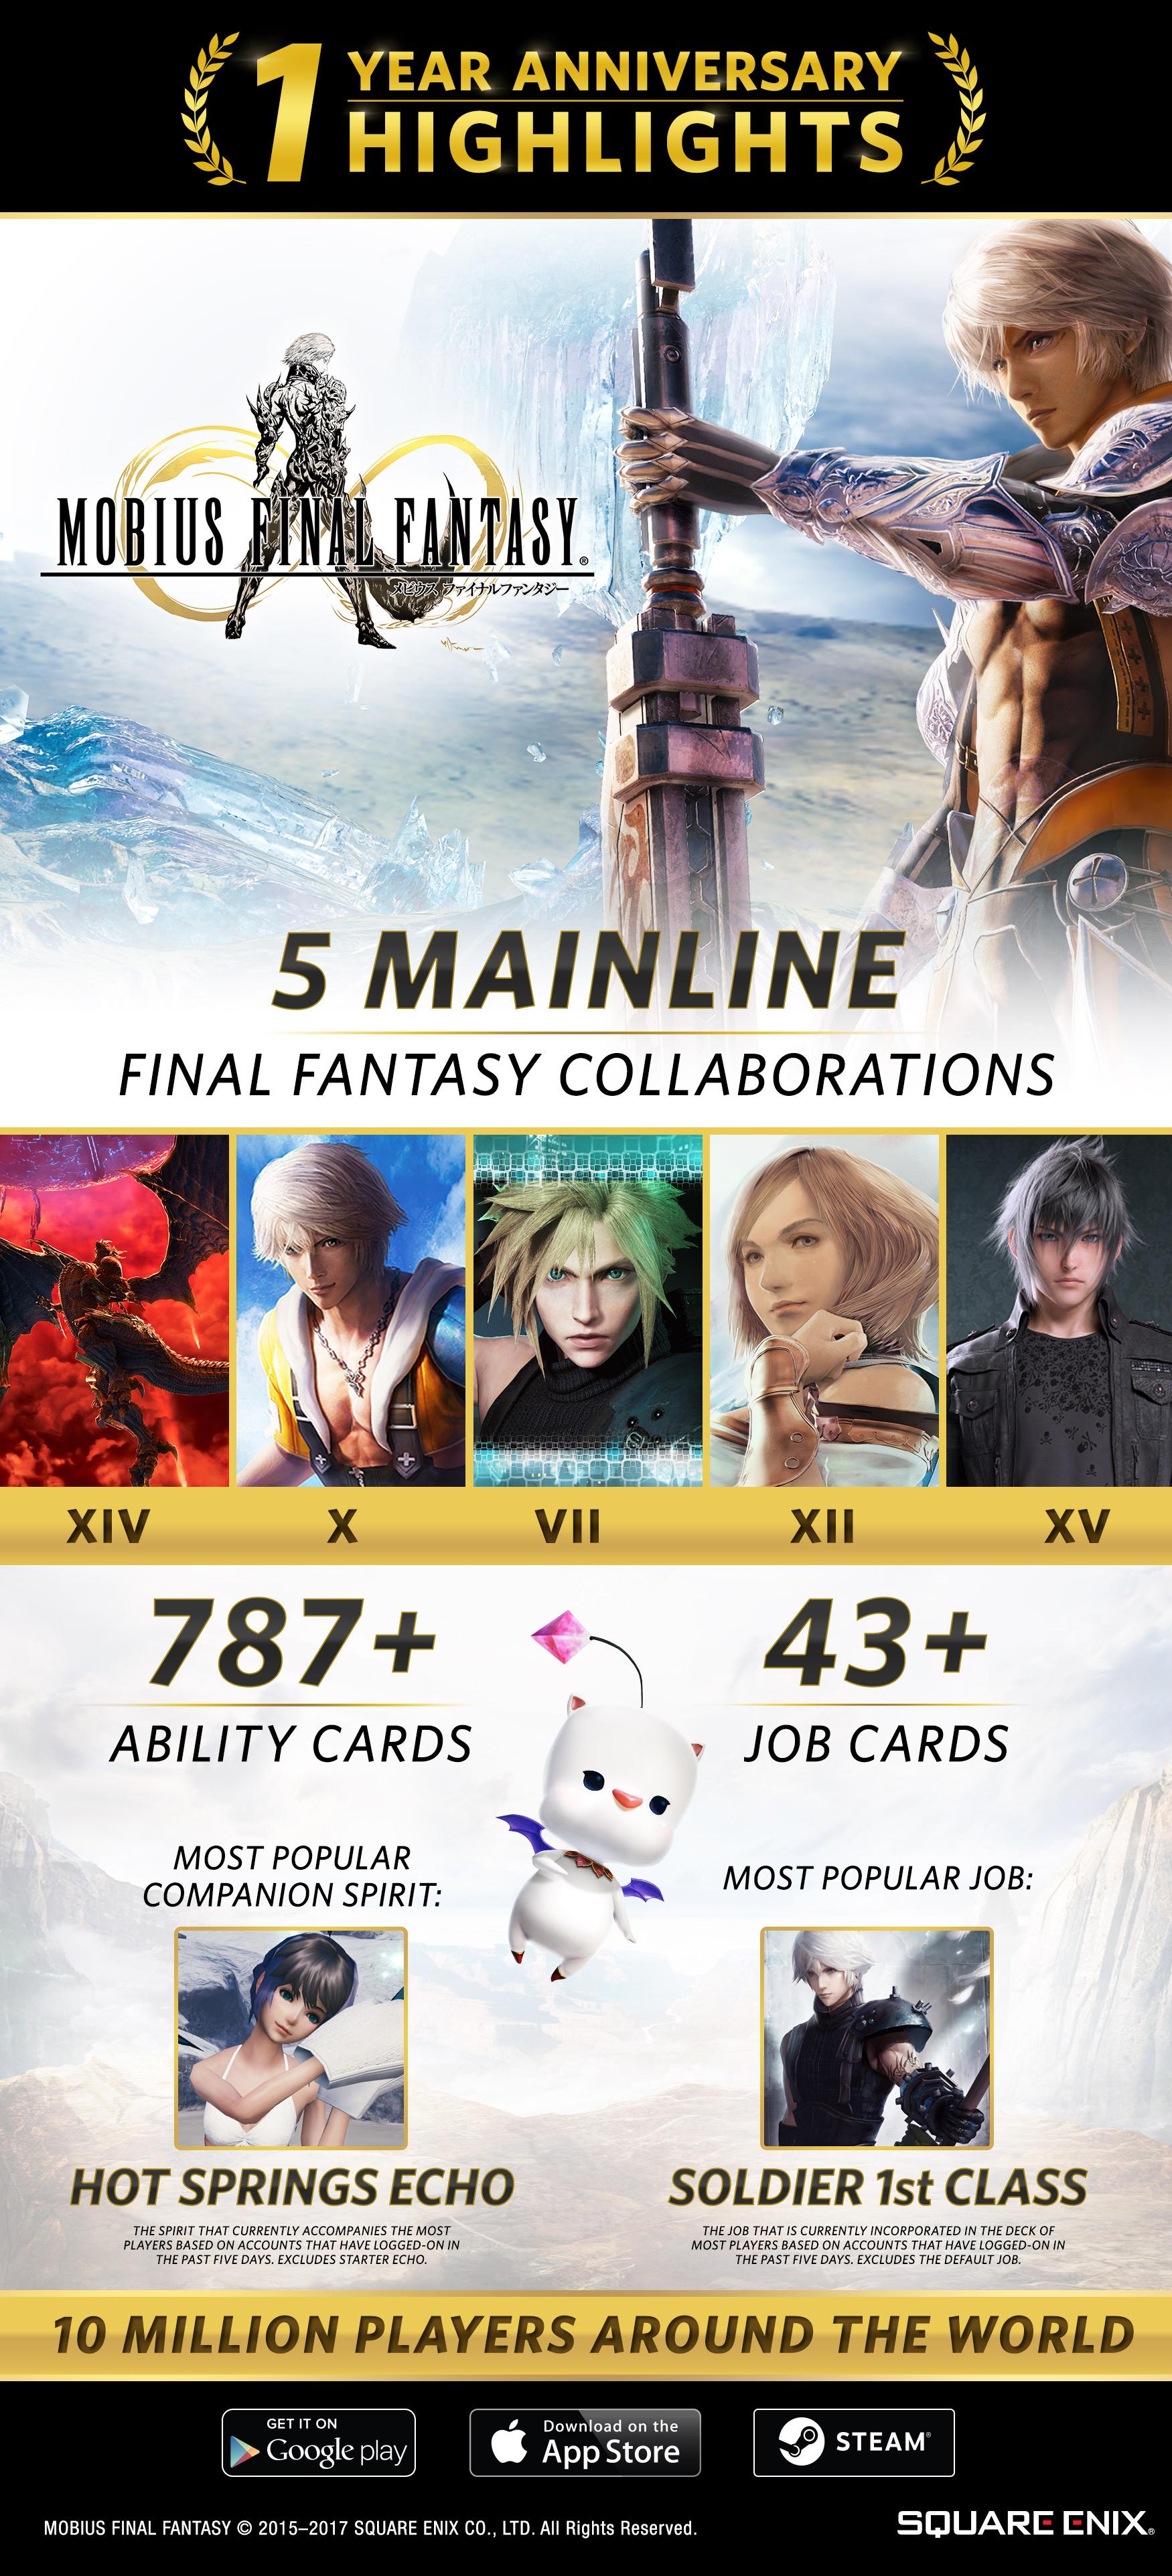 Mobius Final Fantasy Infographic